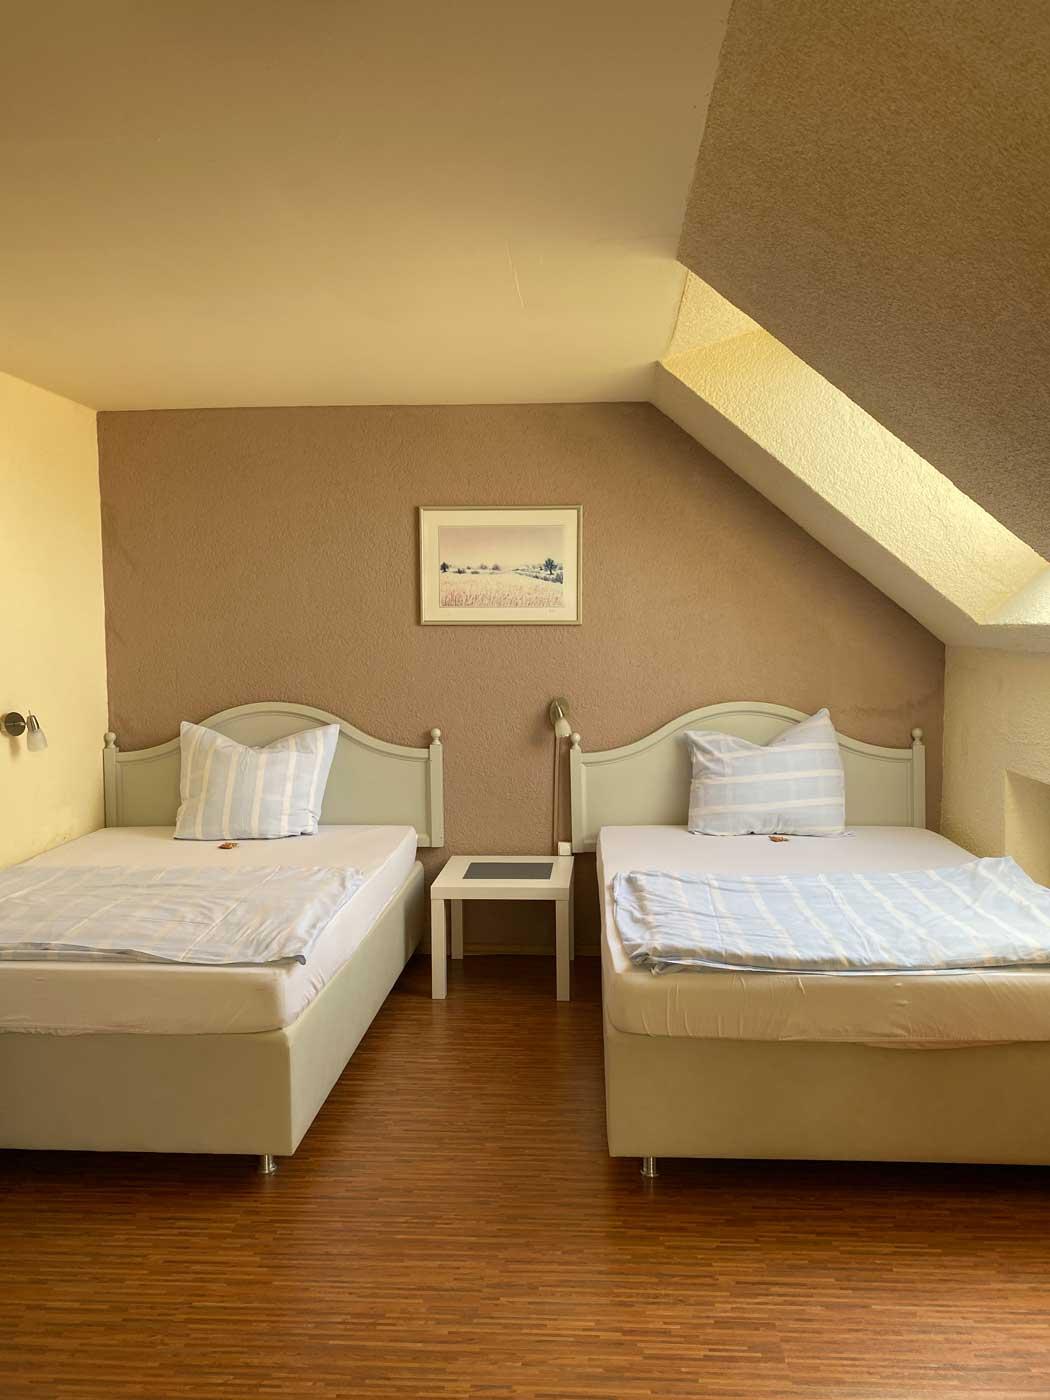 Doppelzimmer-Darmstadt-Riedstadt